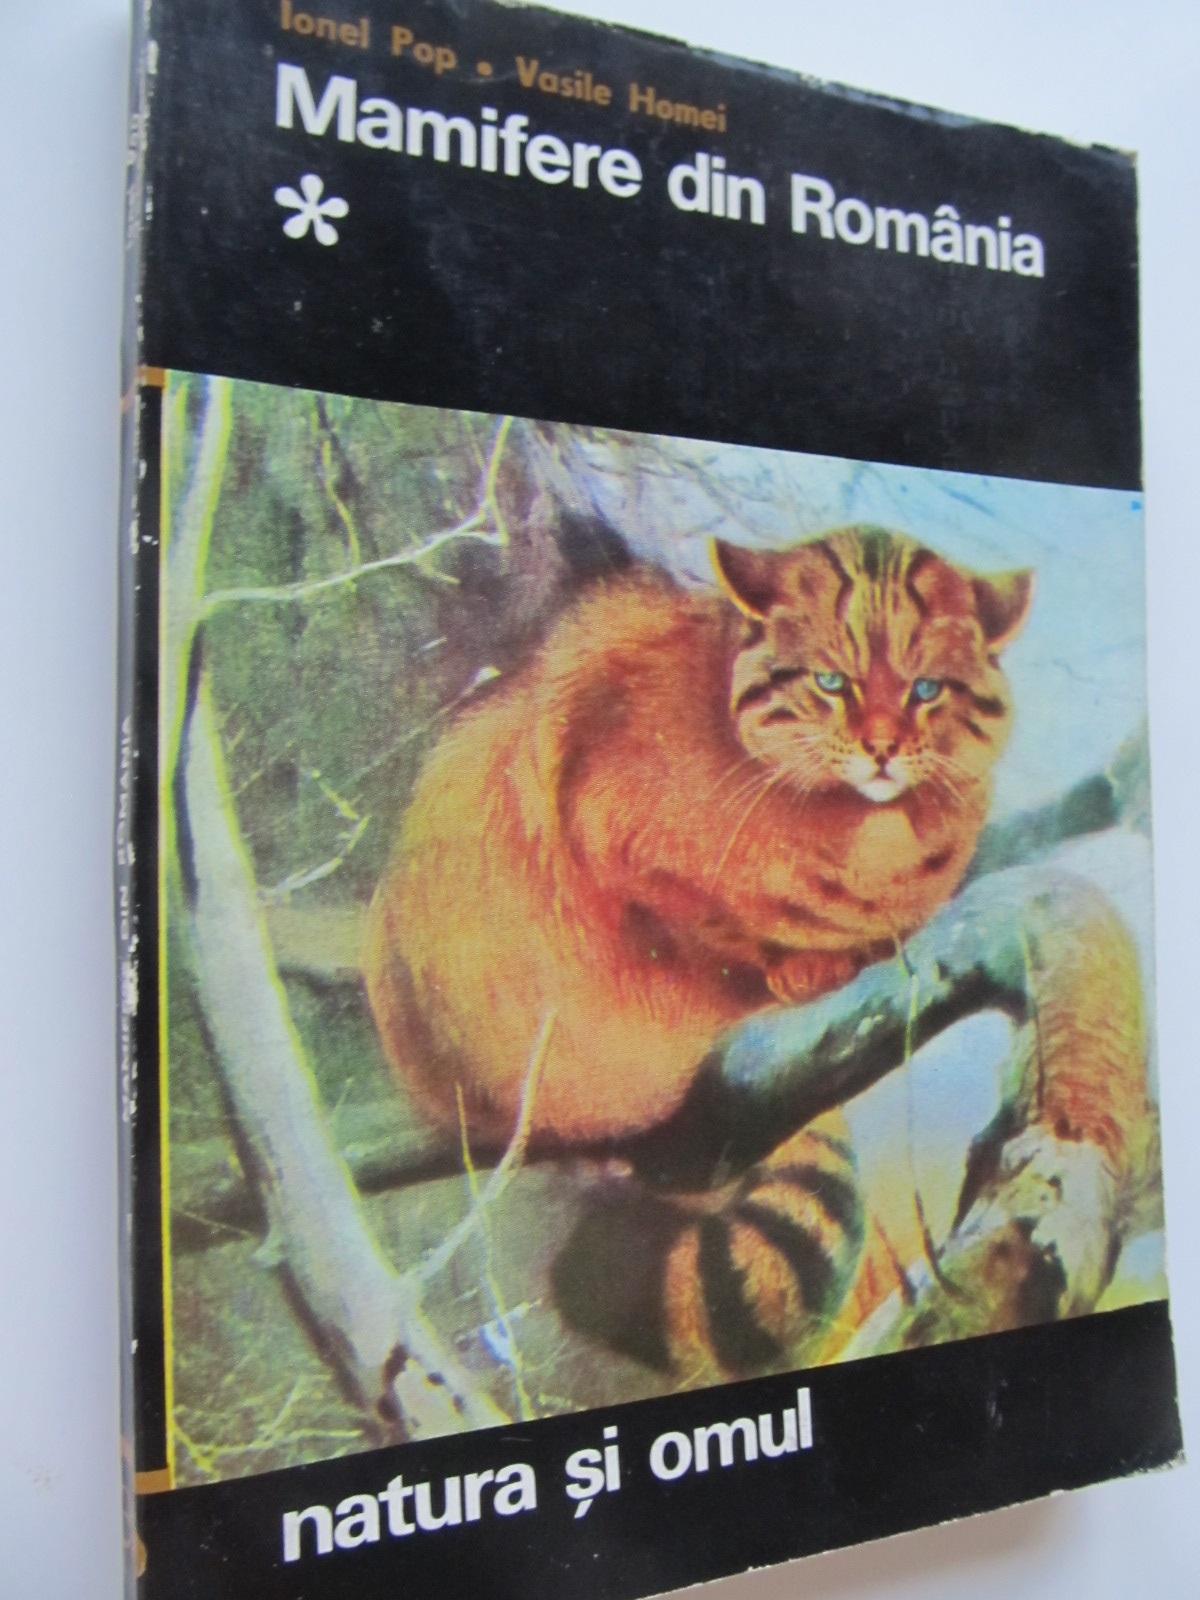 Mamifere din Romania (vol. 1) - Ionel Pop , Vasile Homei | Detalii carte